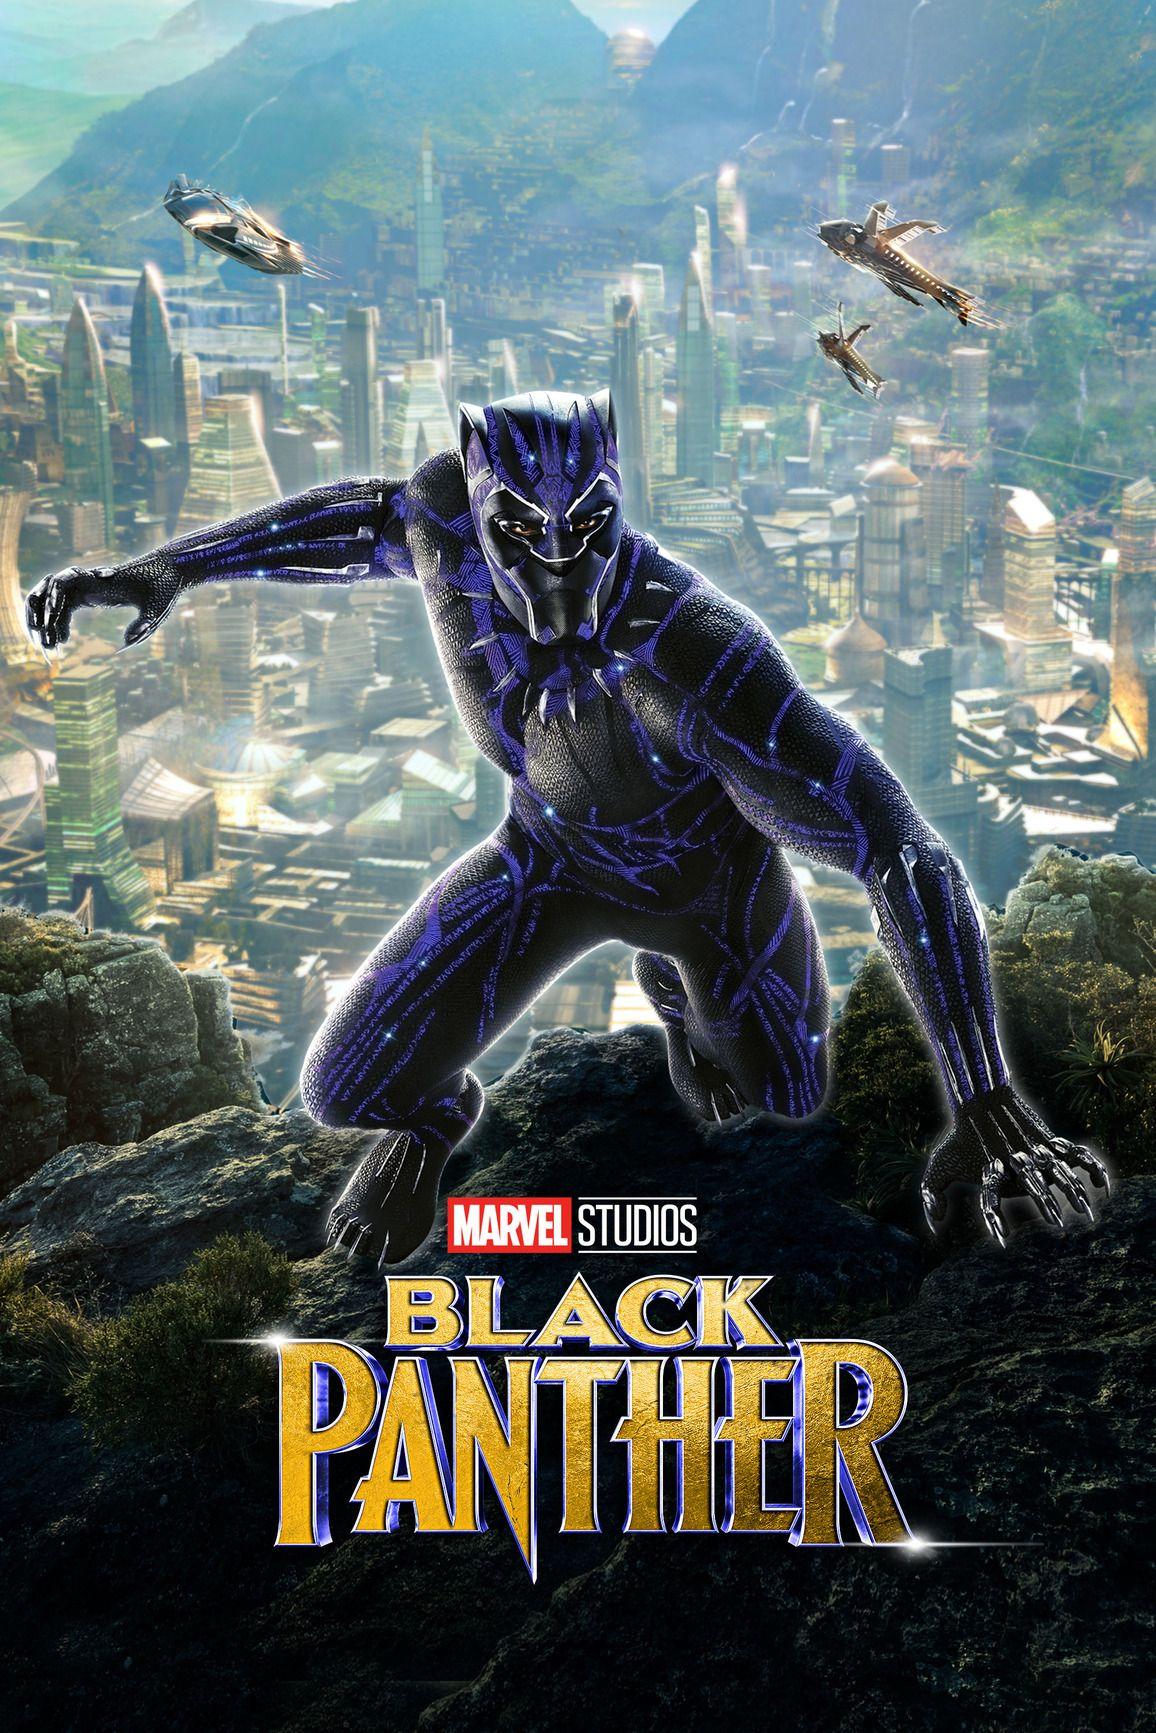 Black panther director ryan coogler cast chadwick